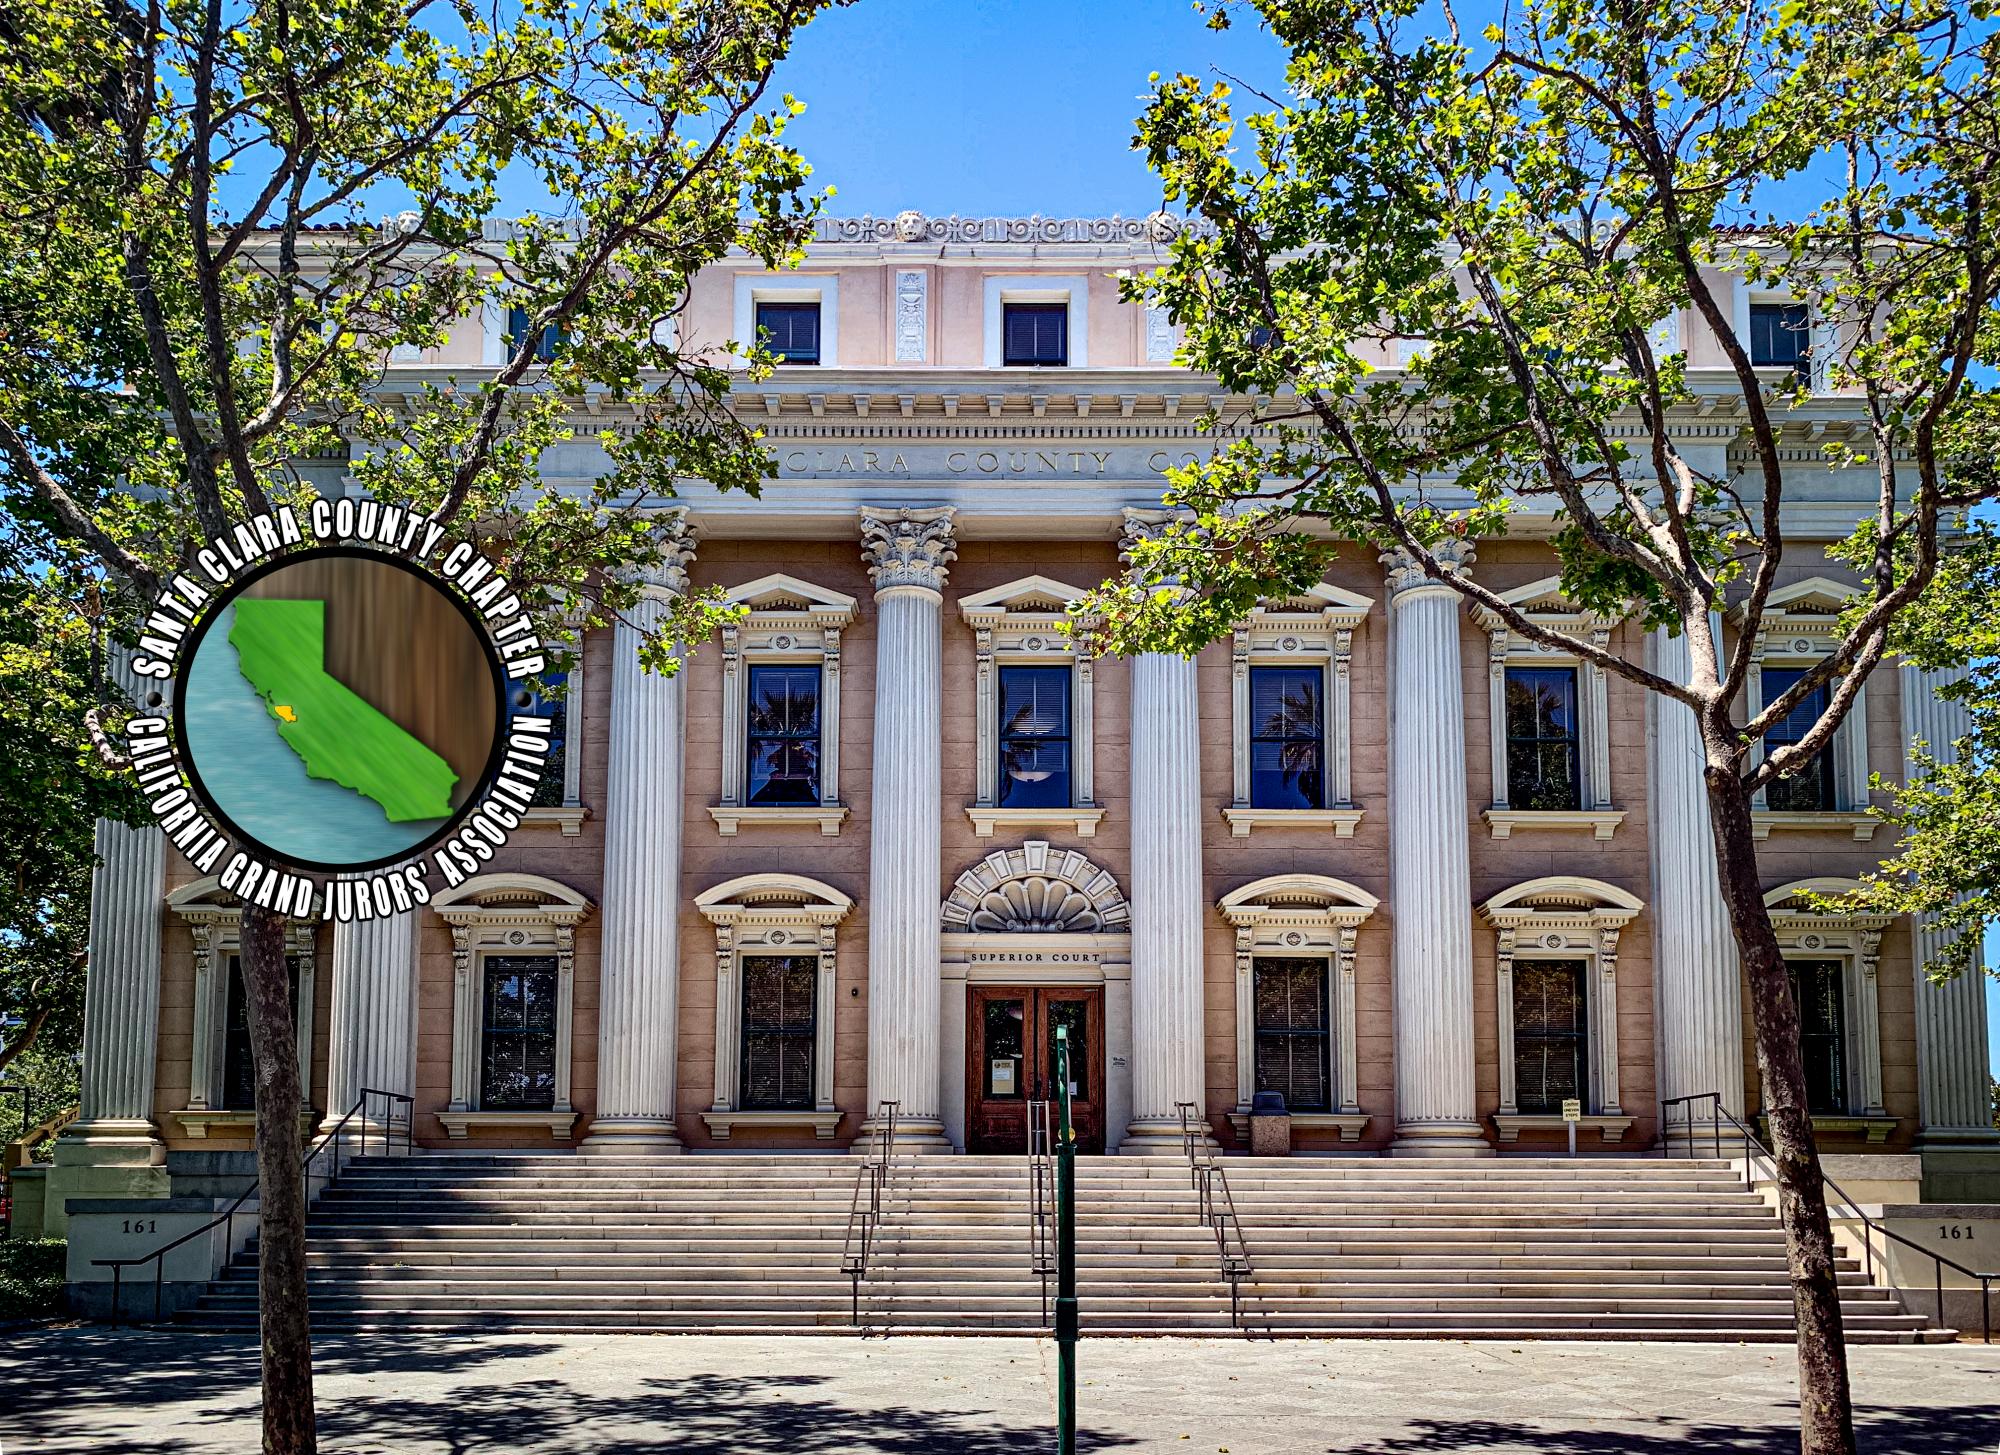 California Grand Jurors' Association